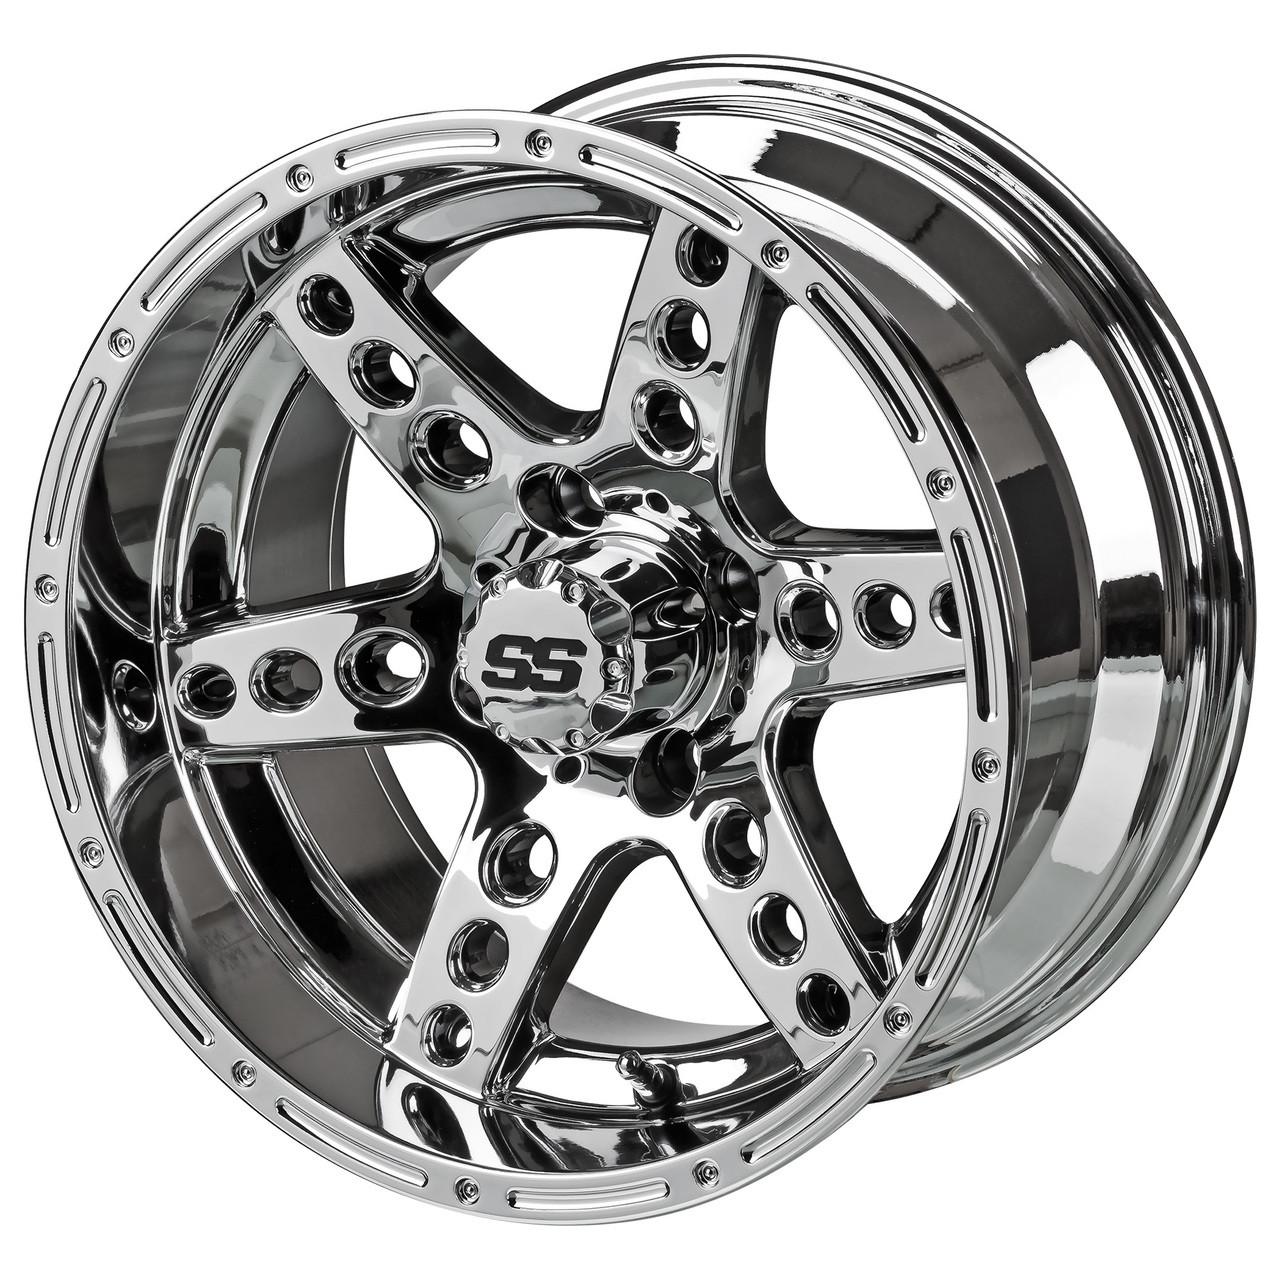 14 Dominator Mirrored Chrome Golf Cart Wheels Set Of 4 Golf Cart Tire Supply